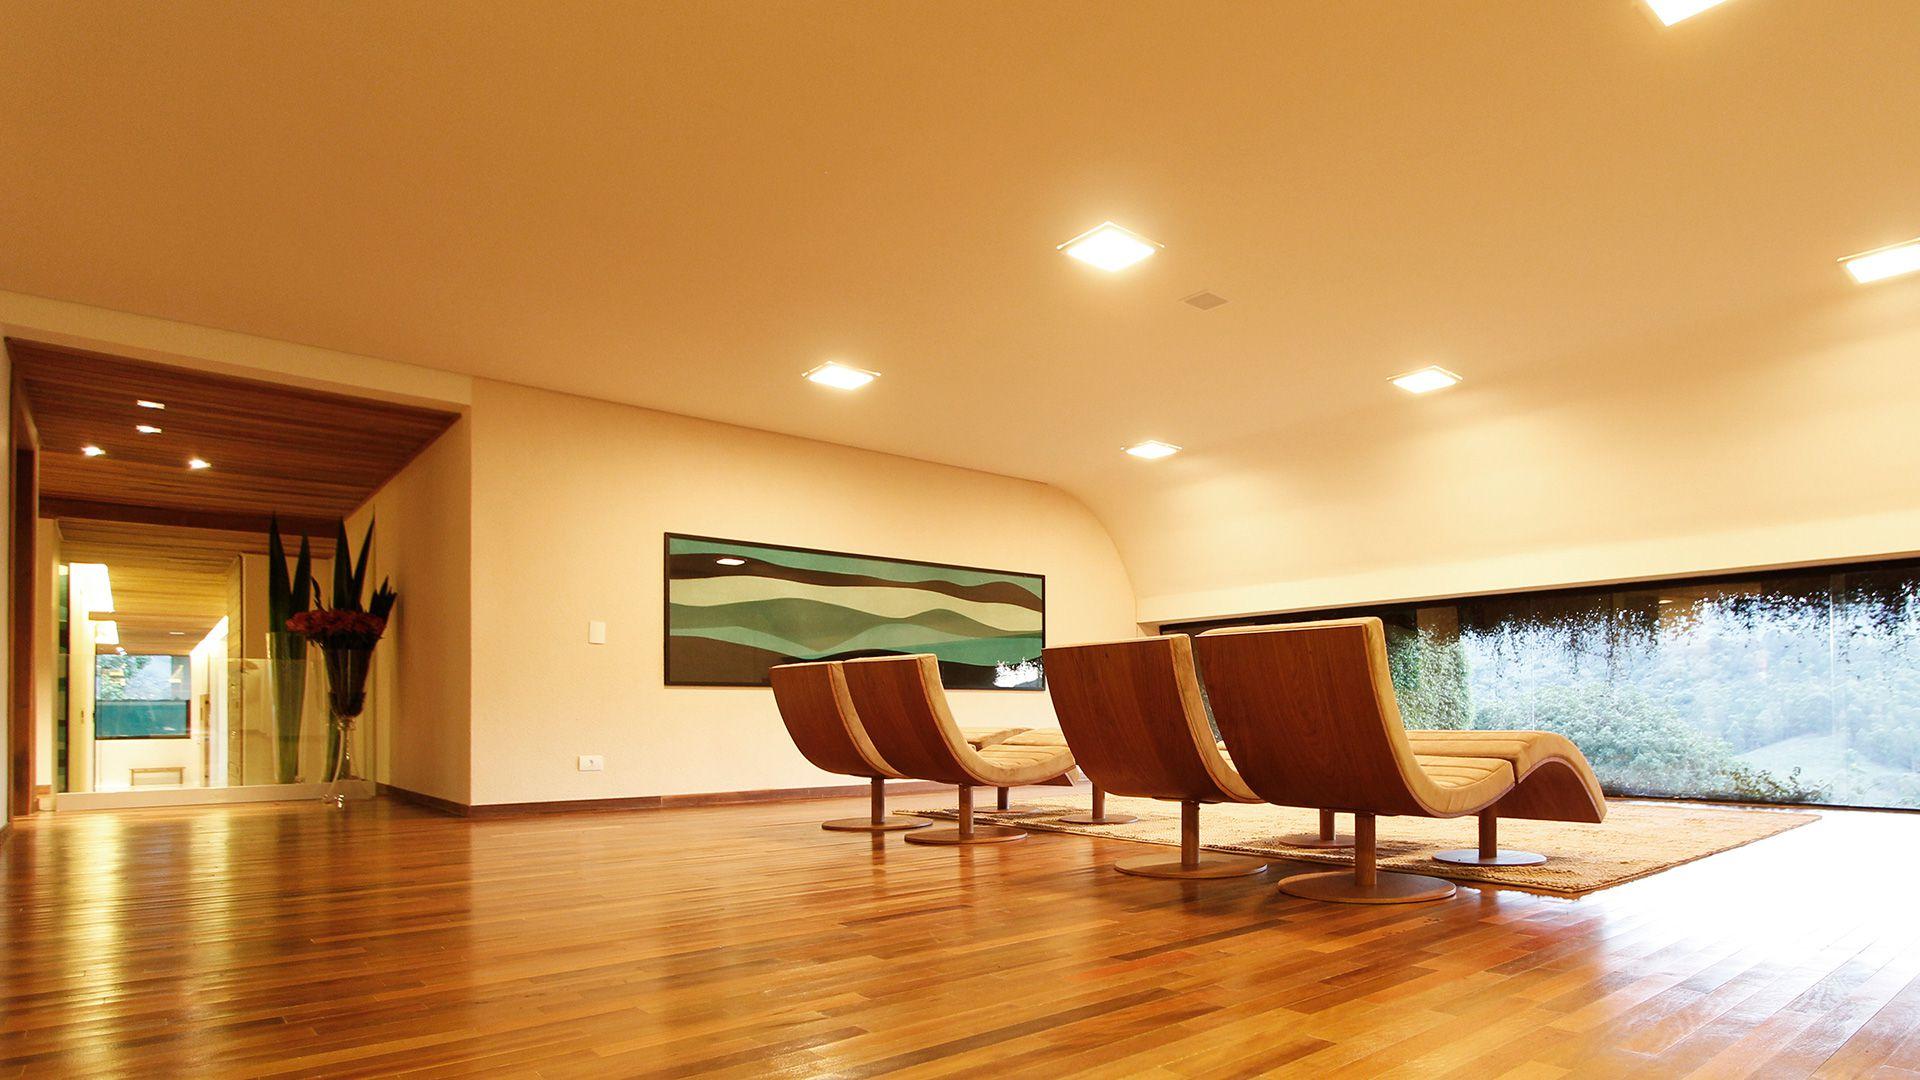 13-spa-hotel-botanique-foto-sala-mobiliario-serigrafia-vista